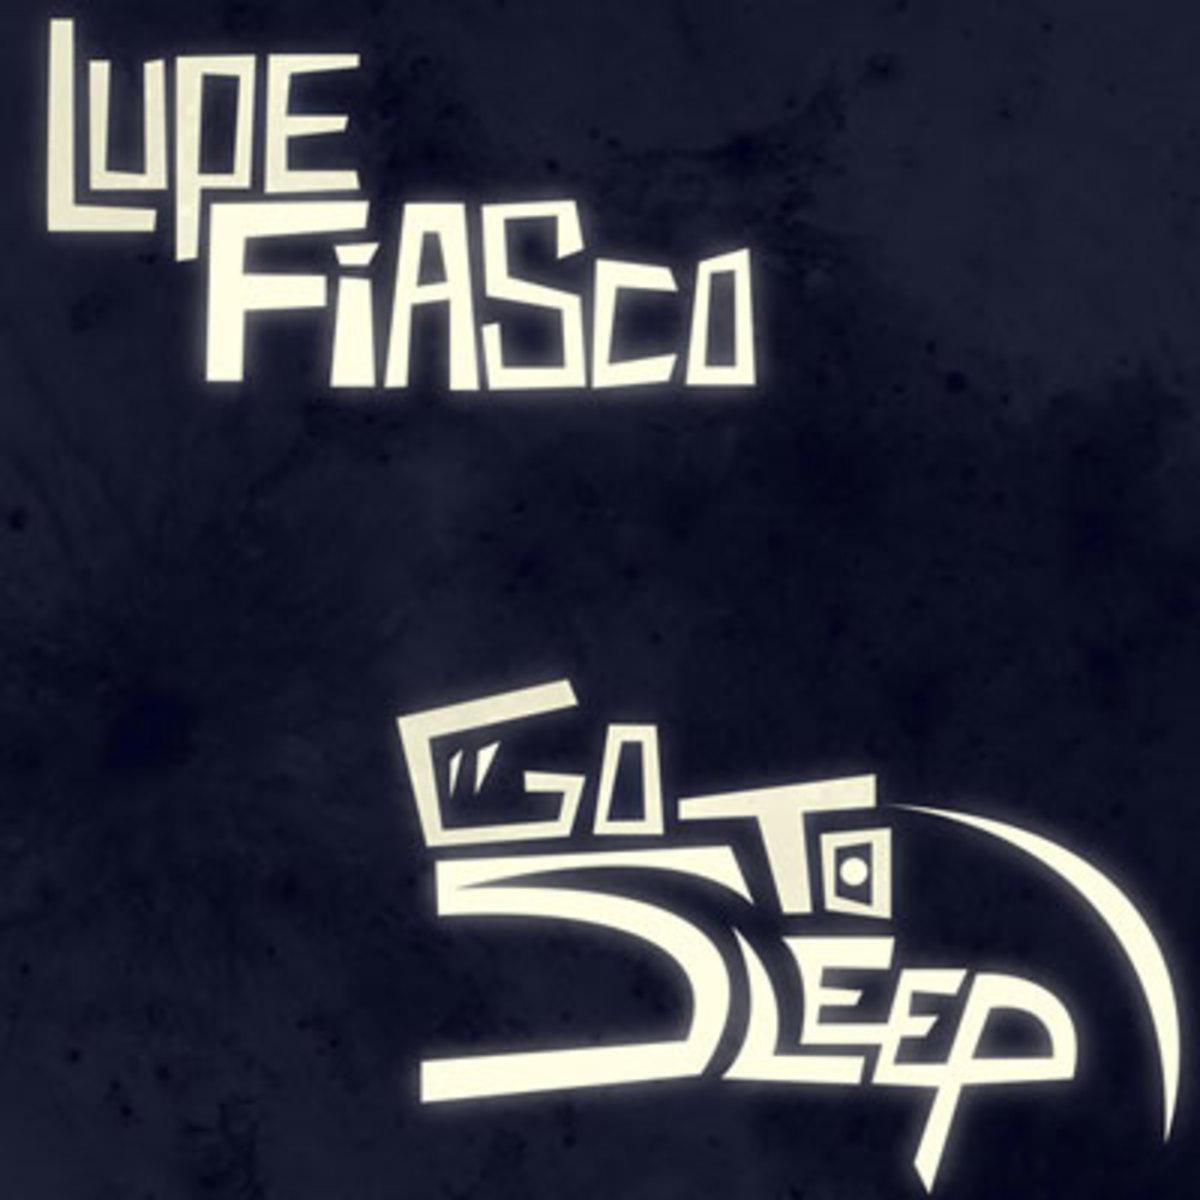 lupefiasco-gotosleep.jpg